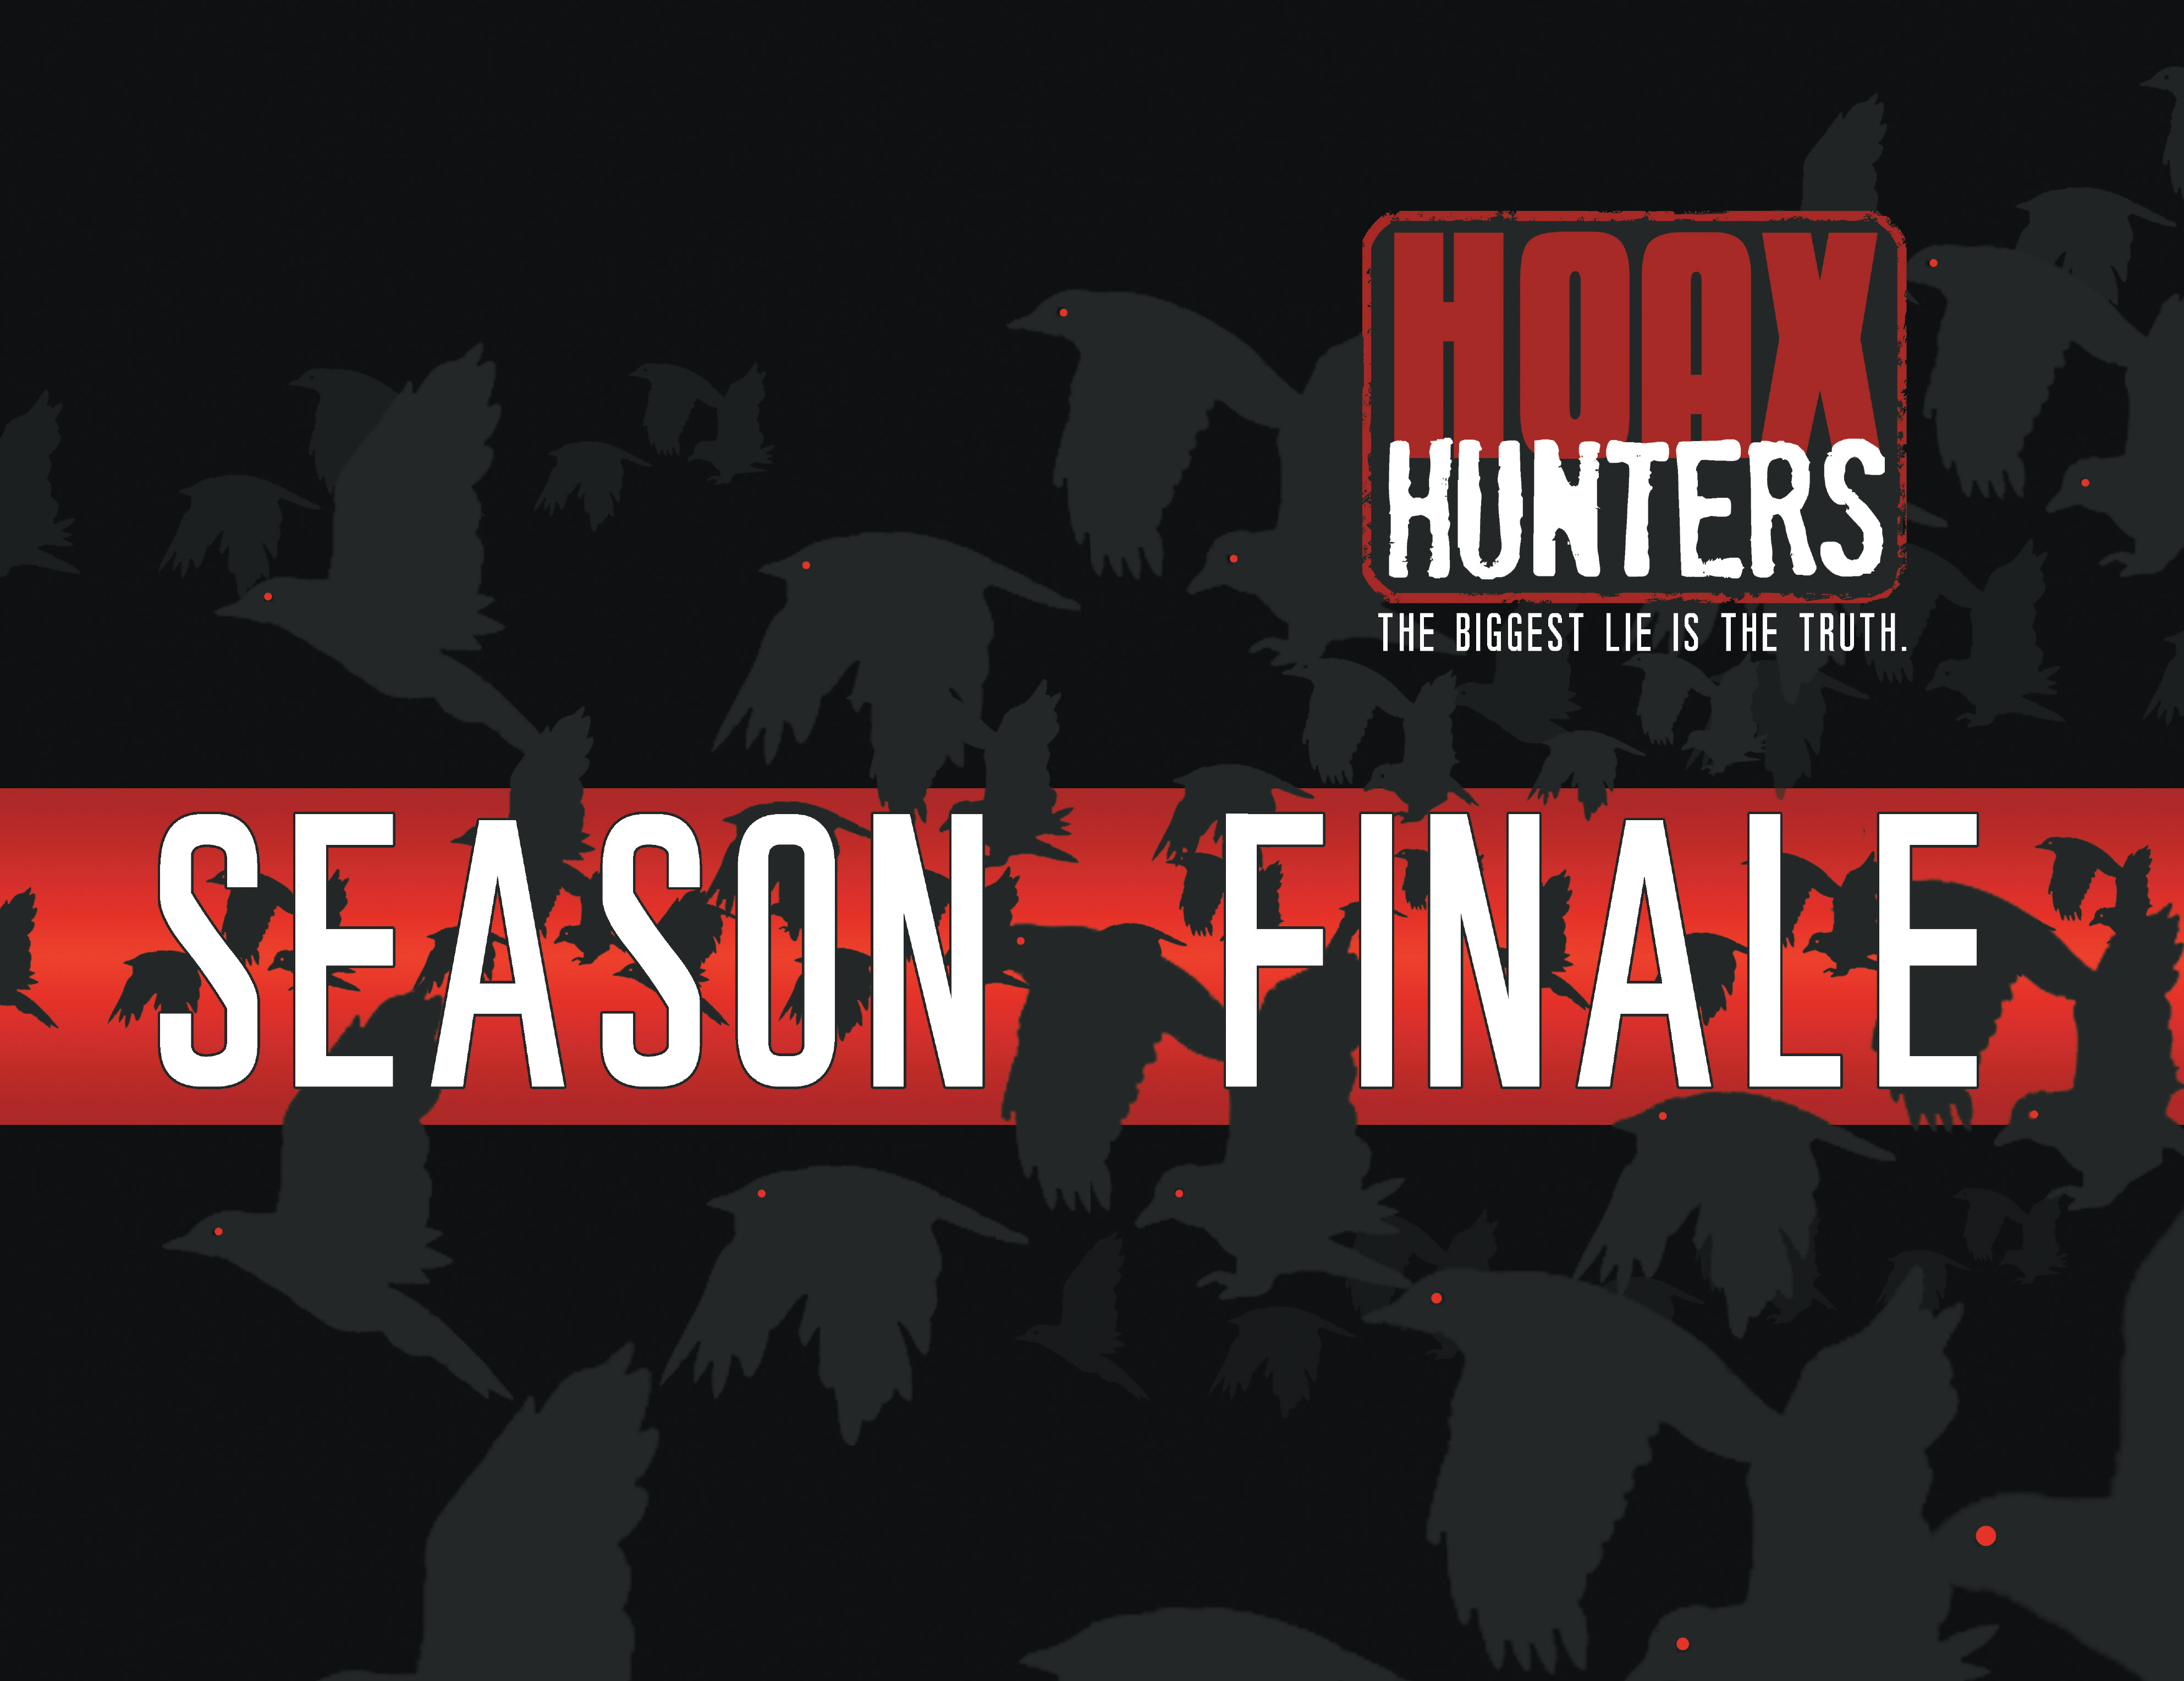 Read online Hoax Hunters (2012) comic -  Issue # TPB 3 - 78